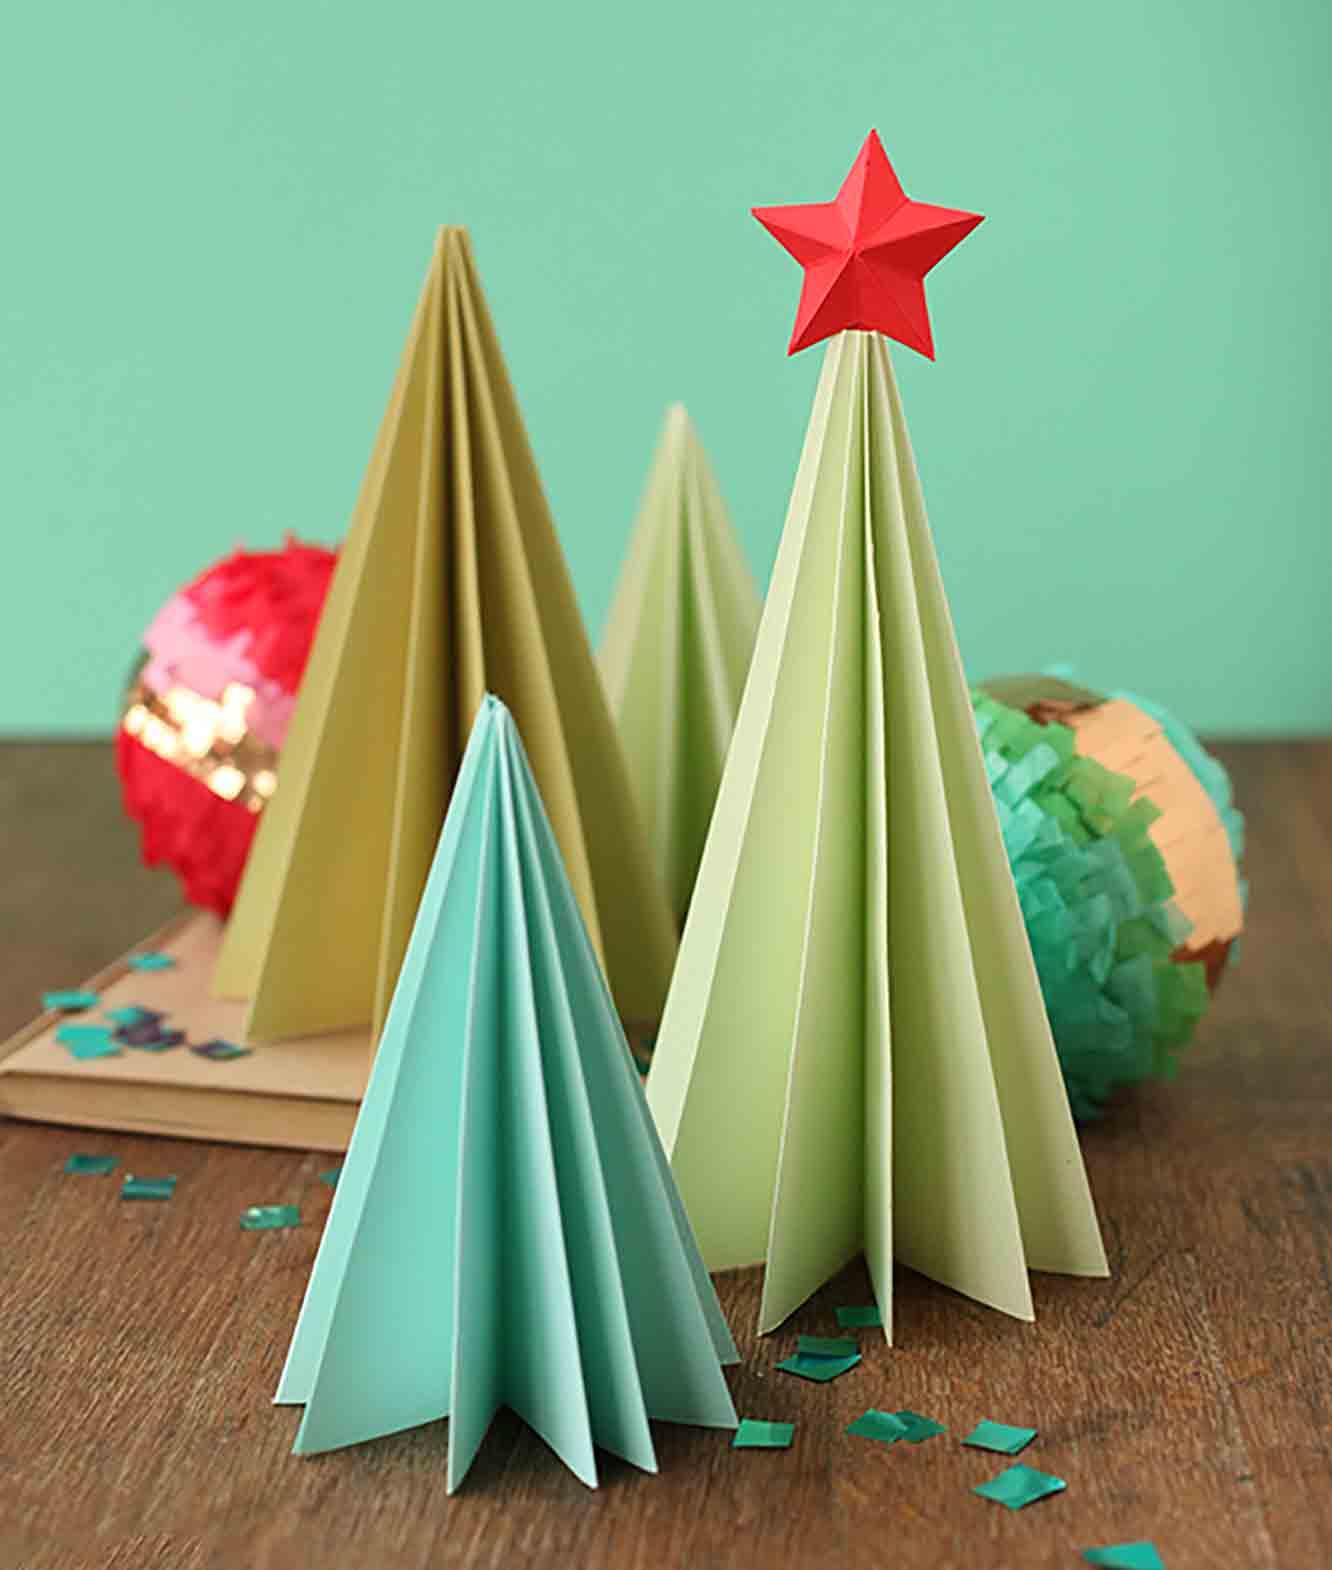 DIY Accordion Paper Trees